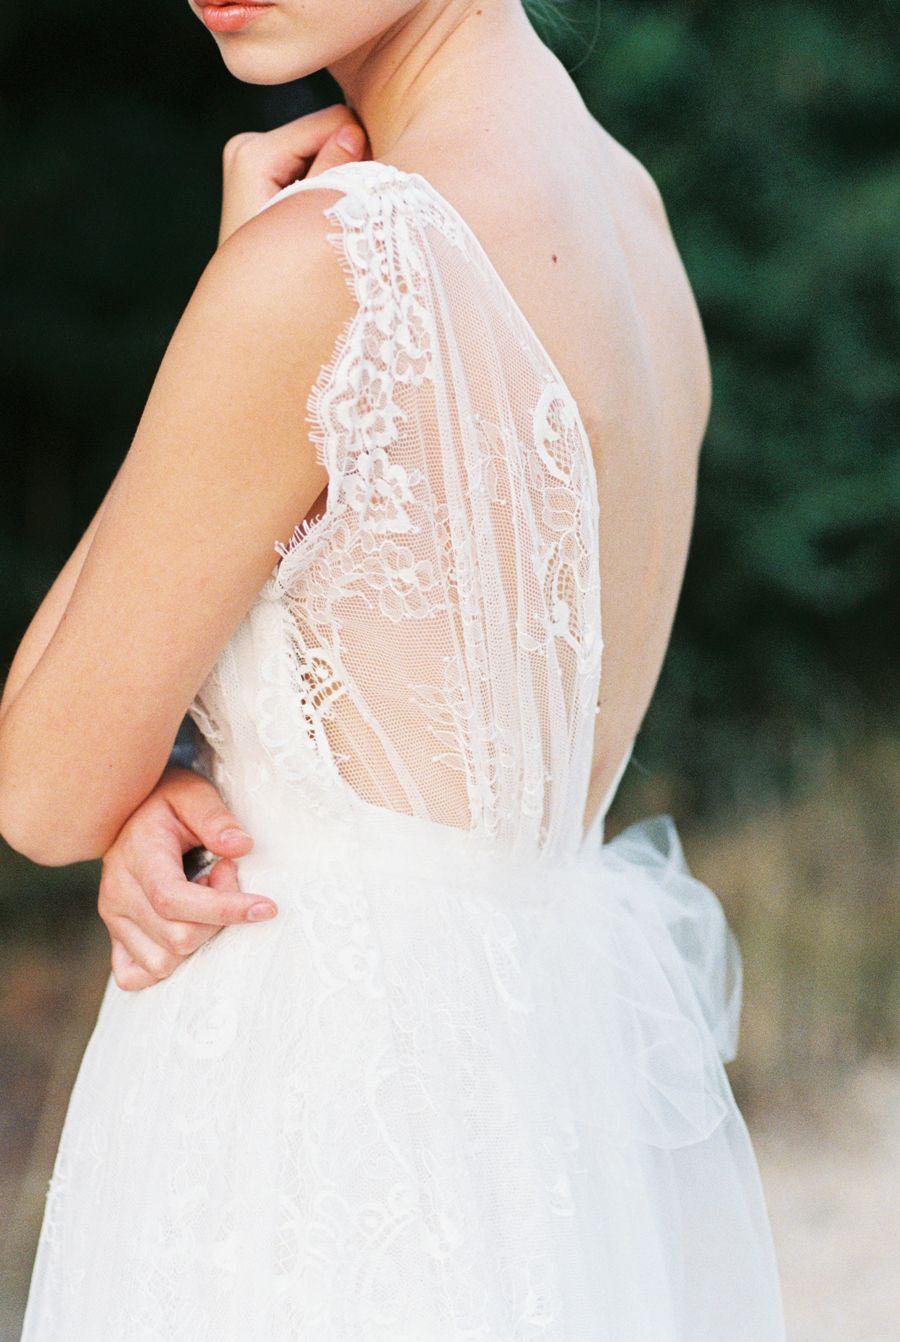 Bridal Gown lace details Headpiece by Bride La Boheme  #bridalheadpieces #weddingaccessories #bridelaboheme ( Instagram @bridelaboheme)